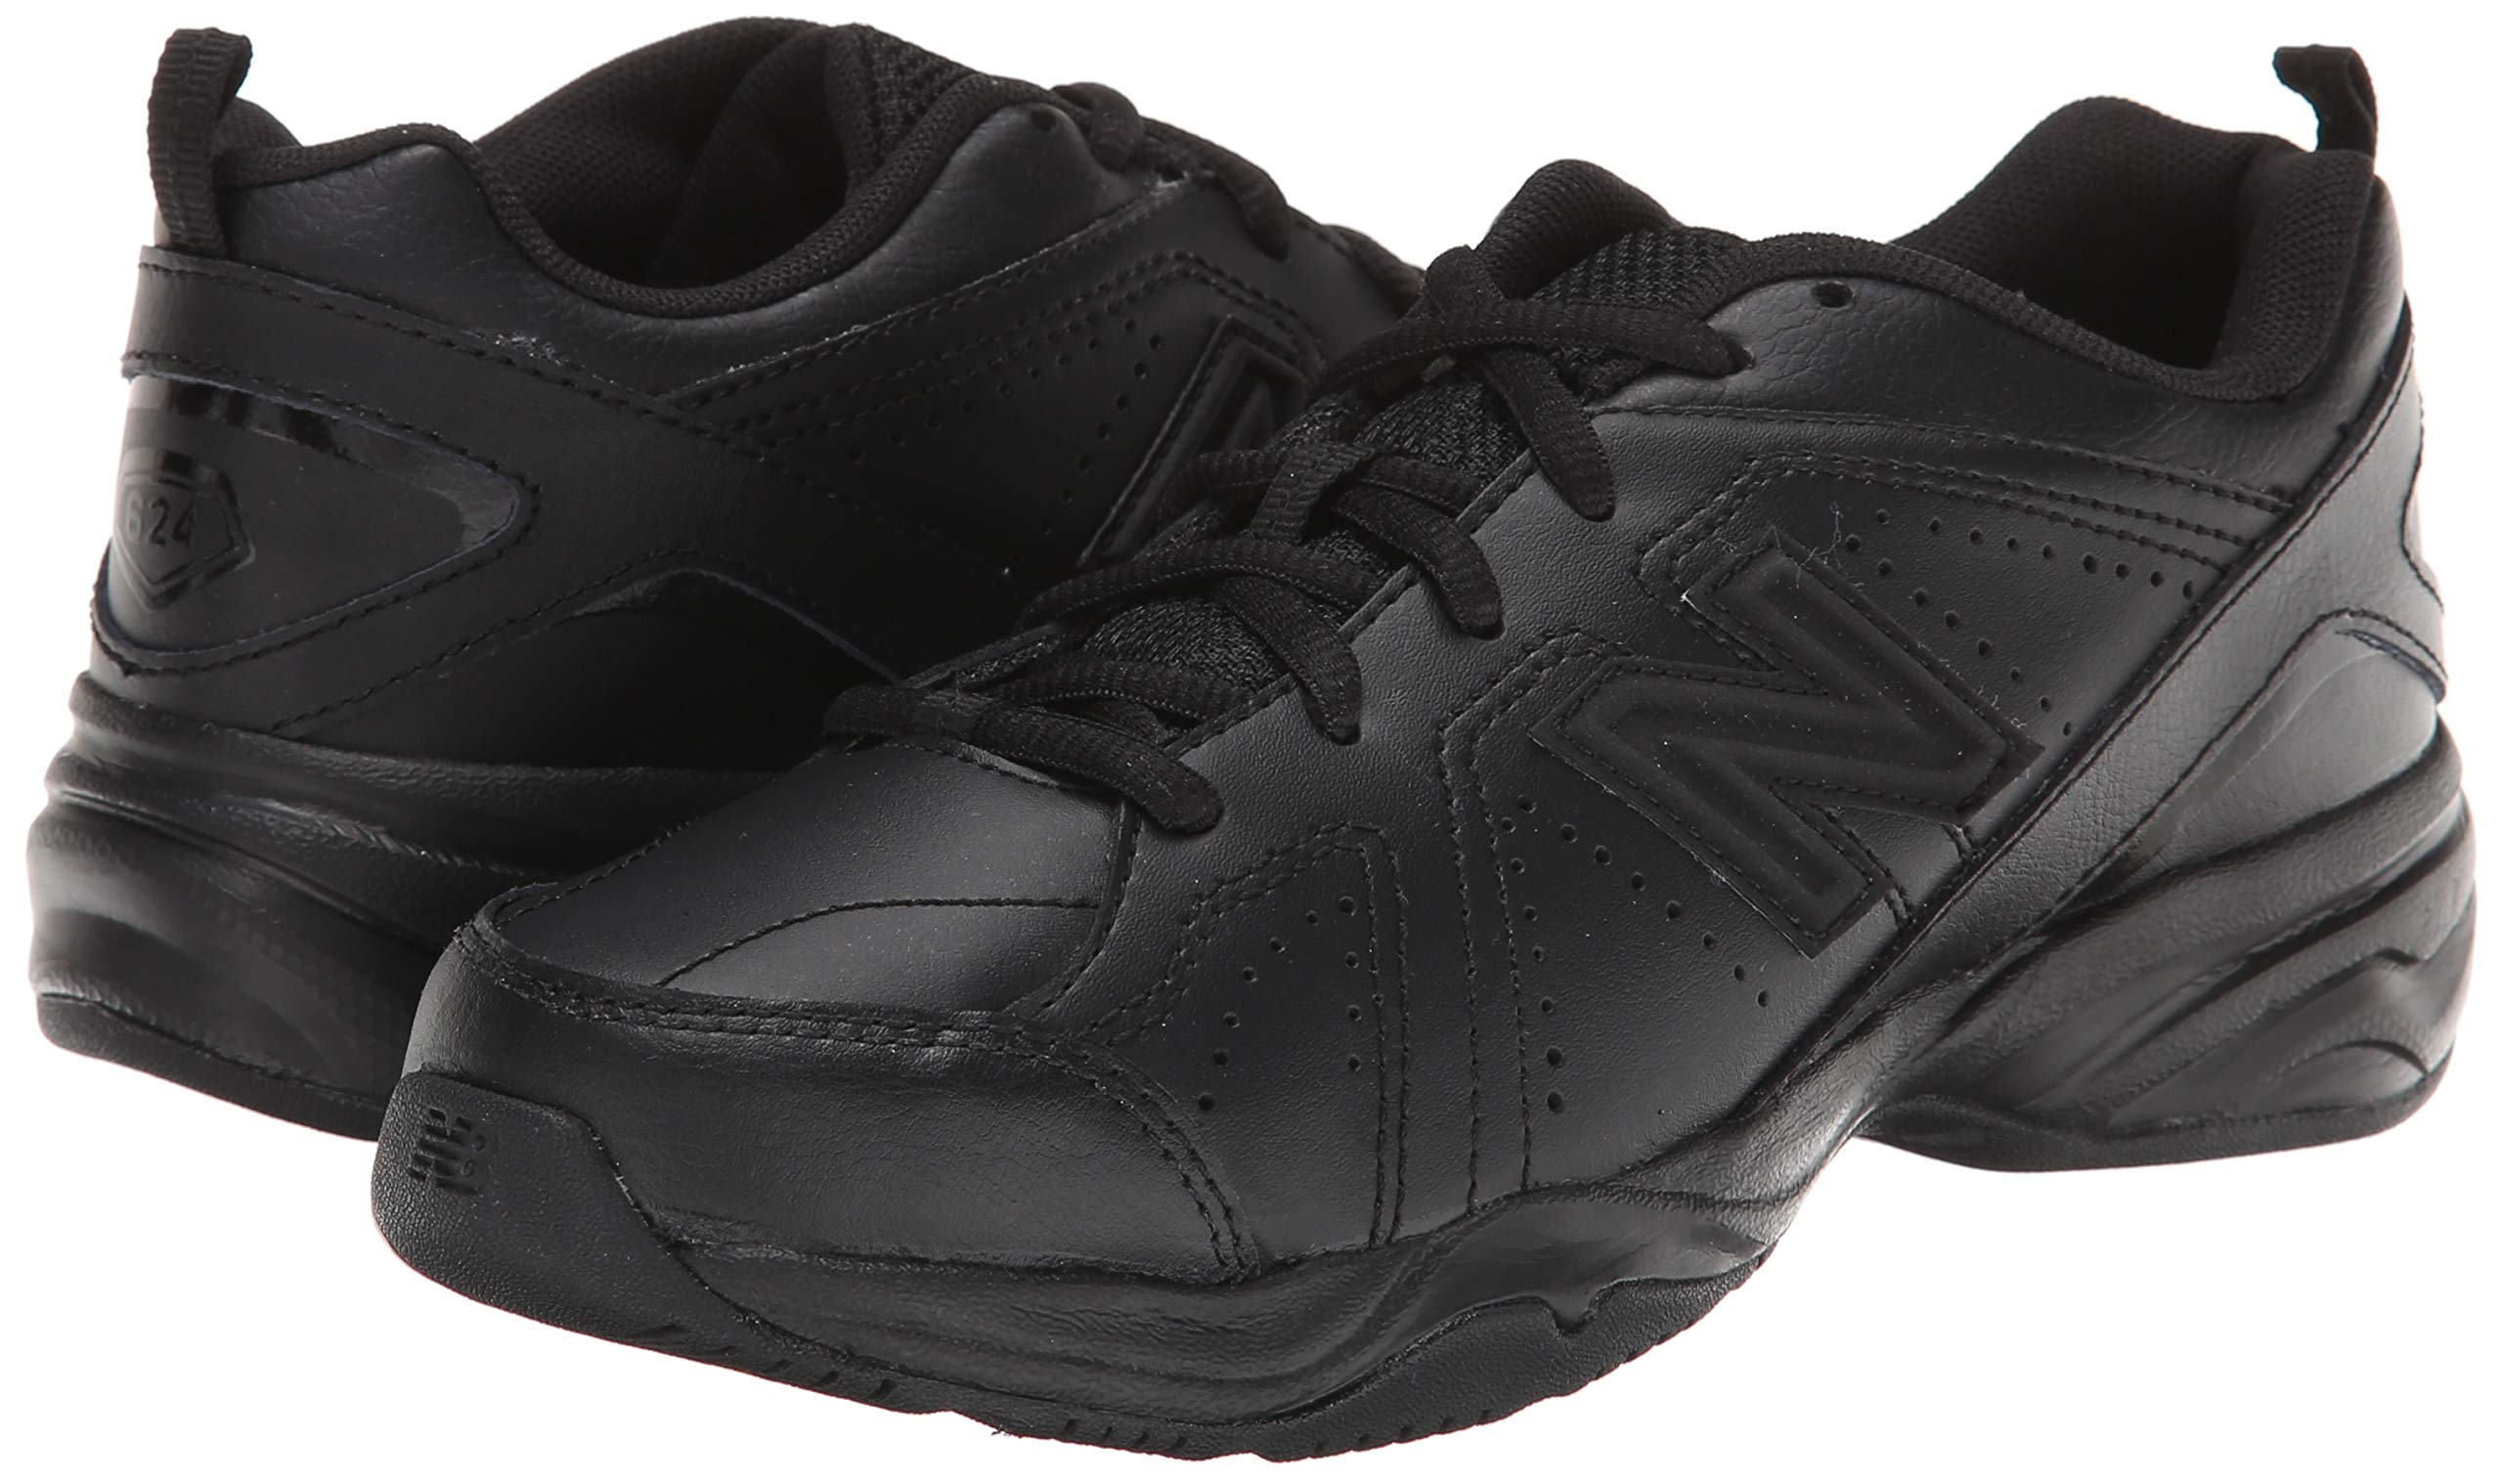 New Balance Boys KX624 Lace-Up Training Shoe ,Black,7 W US Big Kid by New Balance (Image #6)